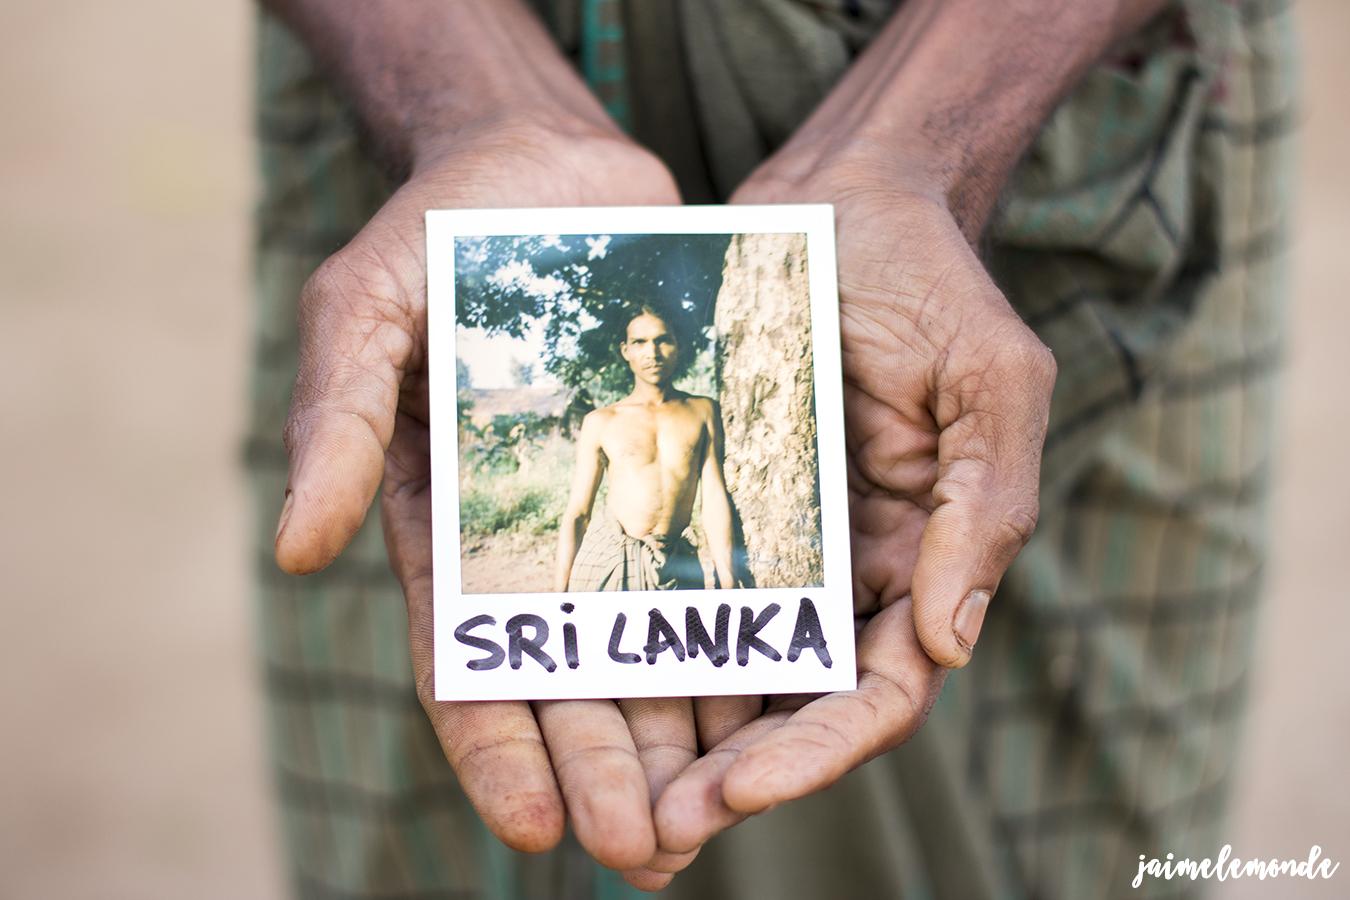 des-polas-et-des-mains-voyage-au-sri-lanka-2016-jaimelemonde-3